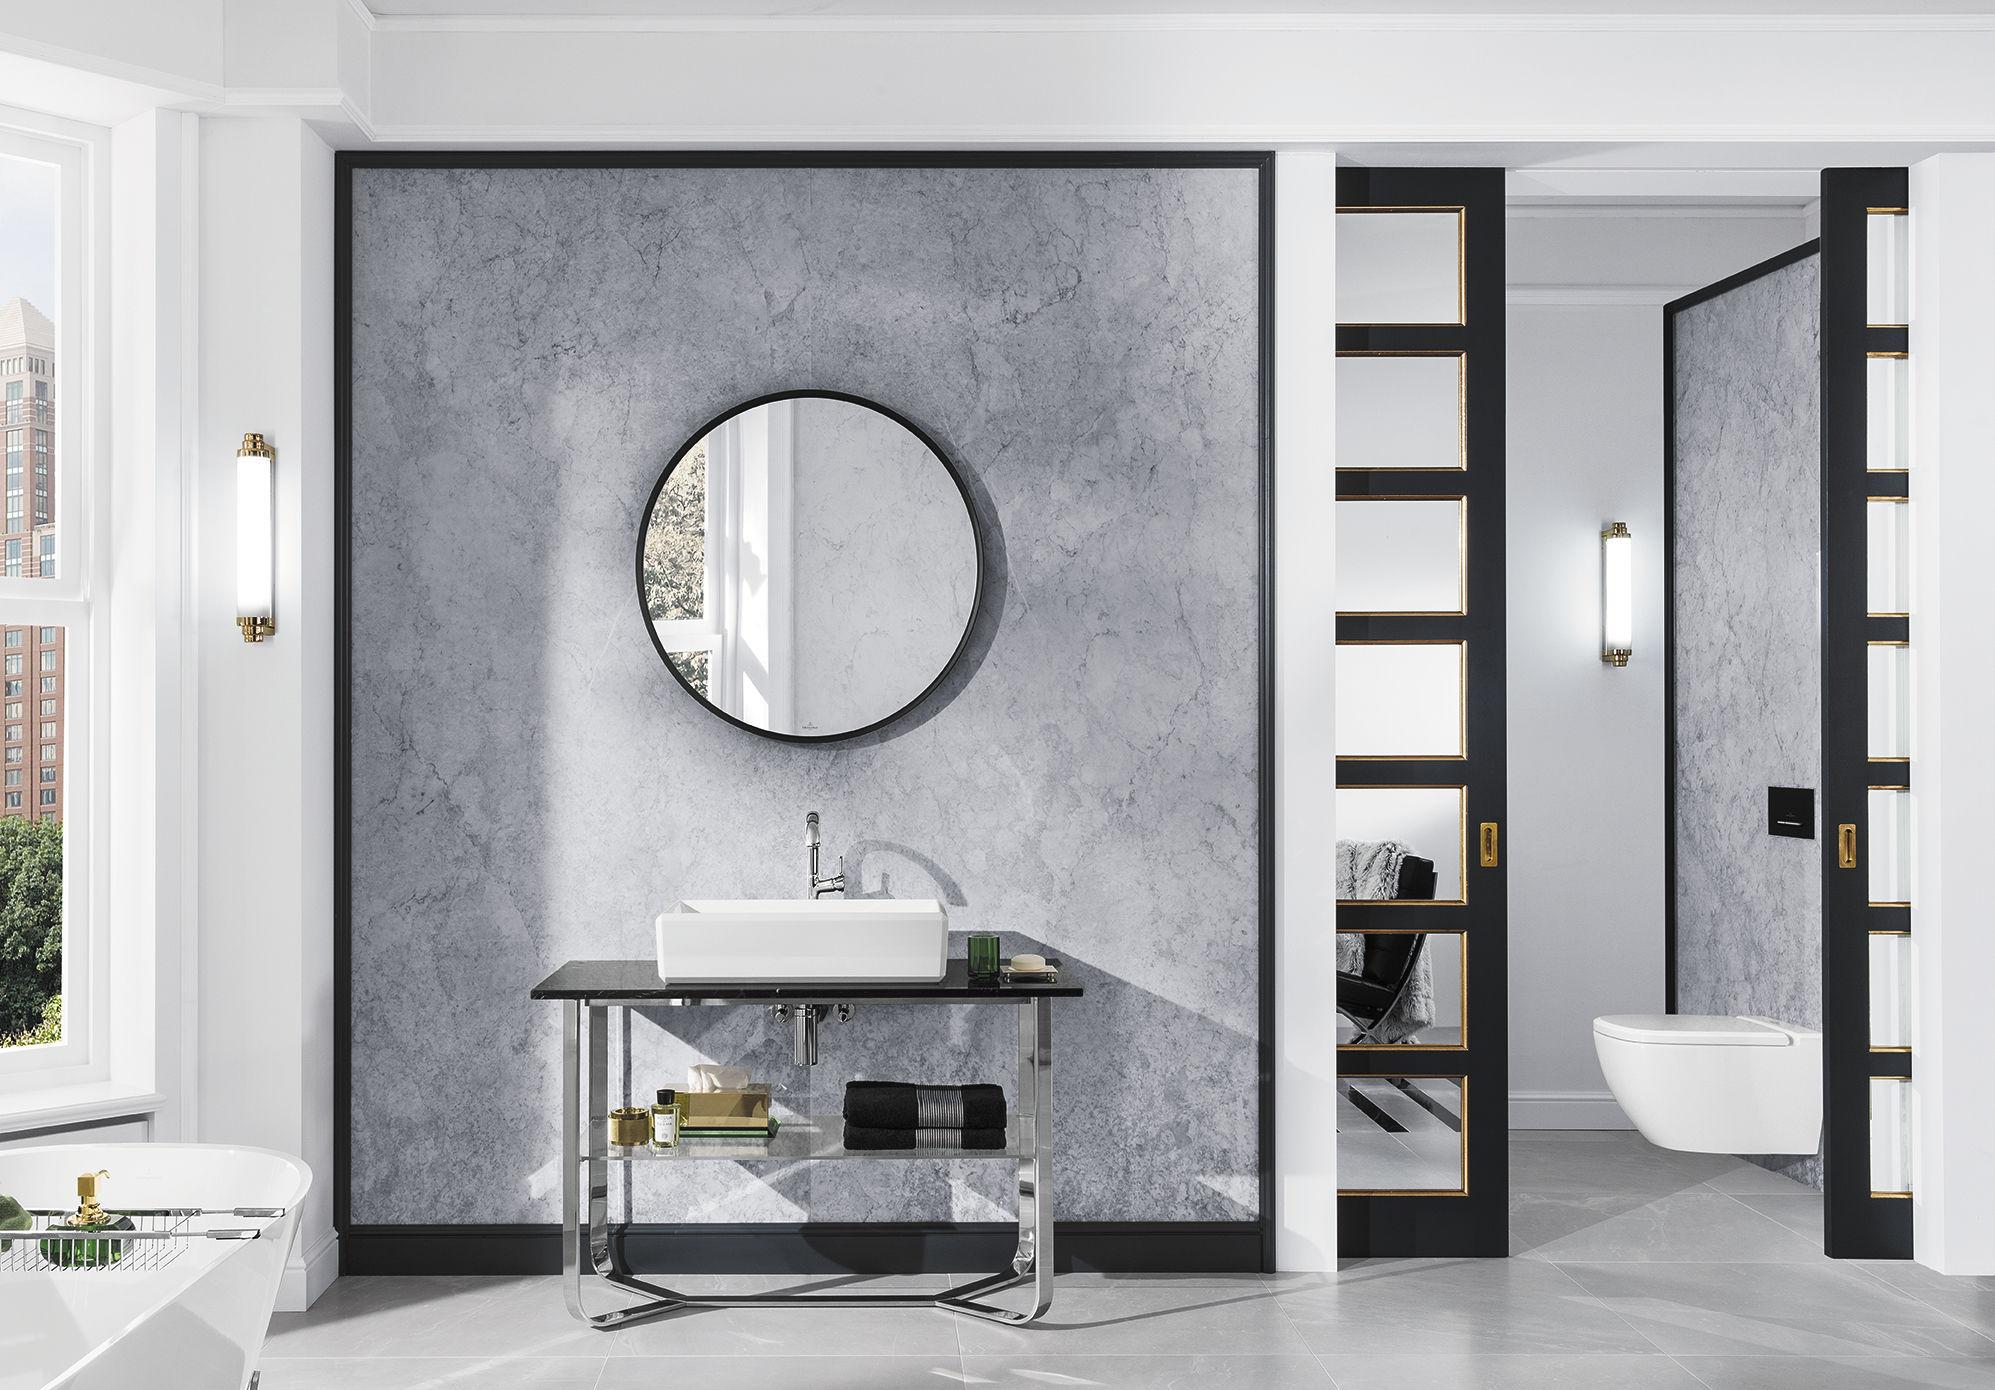 Bagno moderno - in ceramica, in marmo, in acciaio inossidabile - ANTHEUS